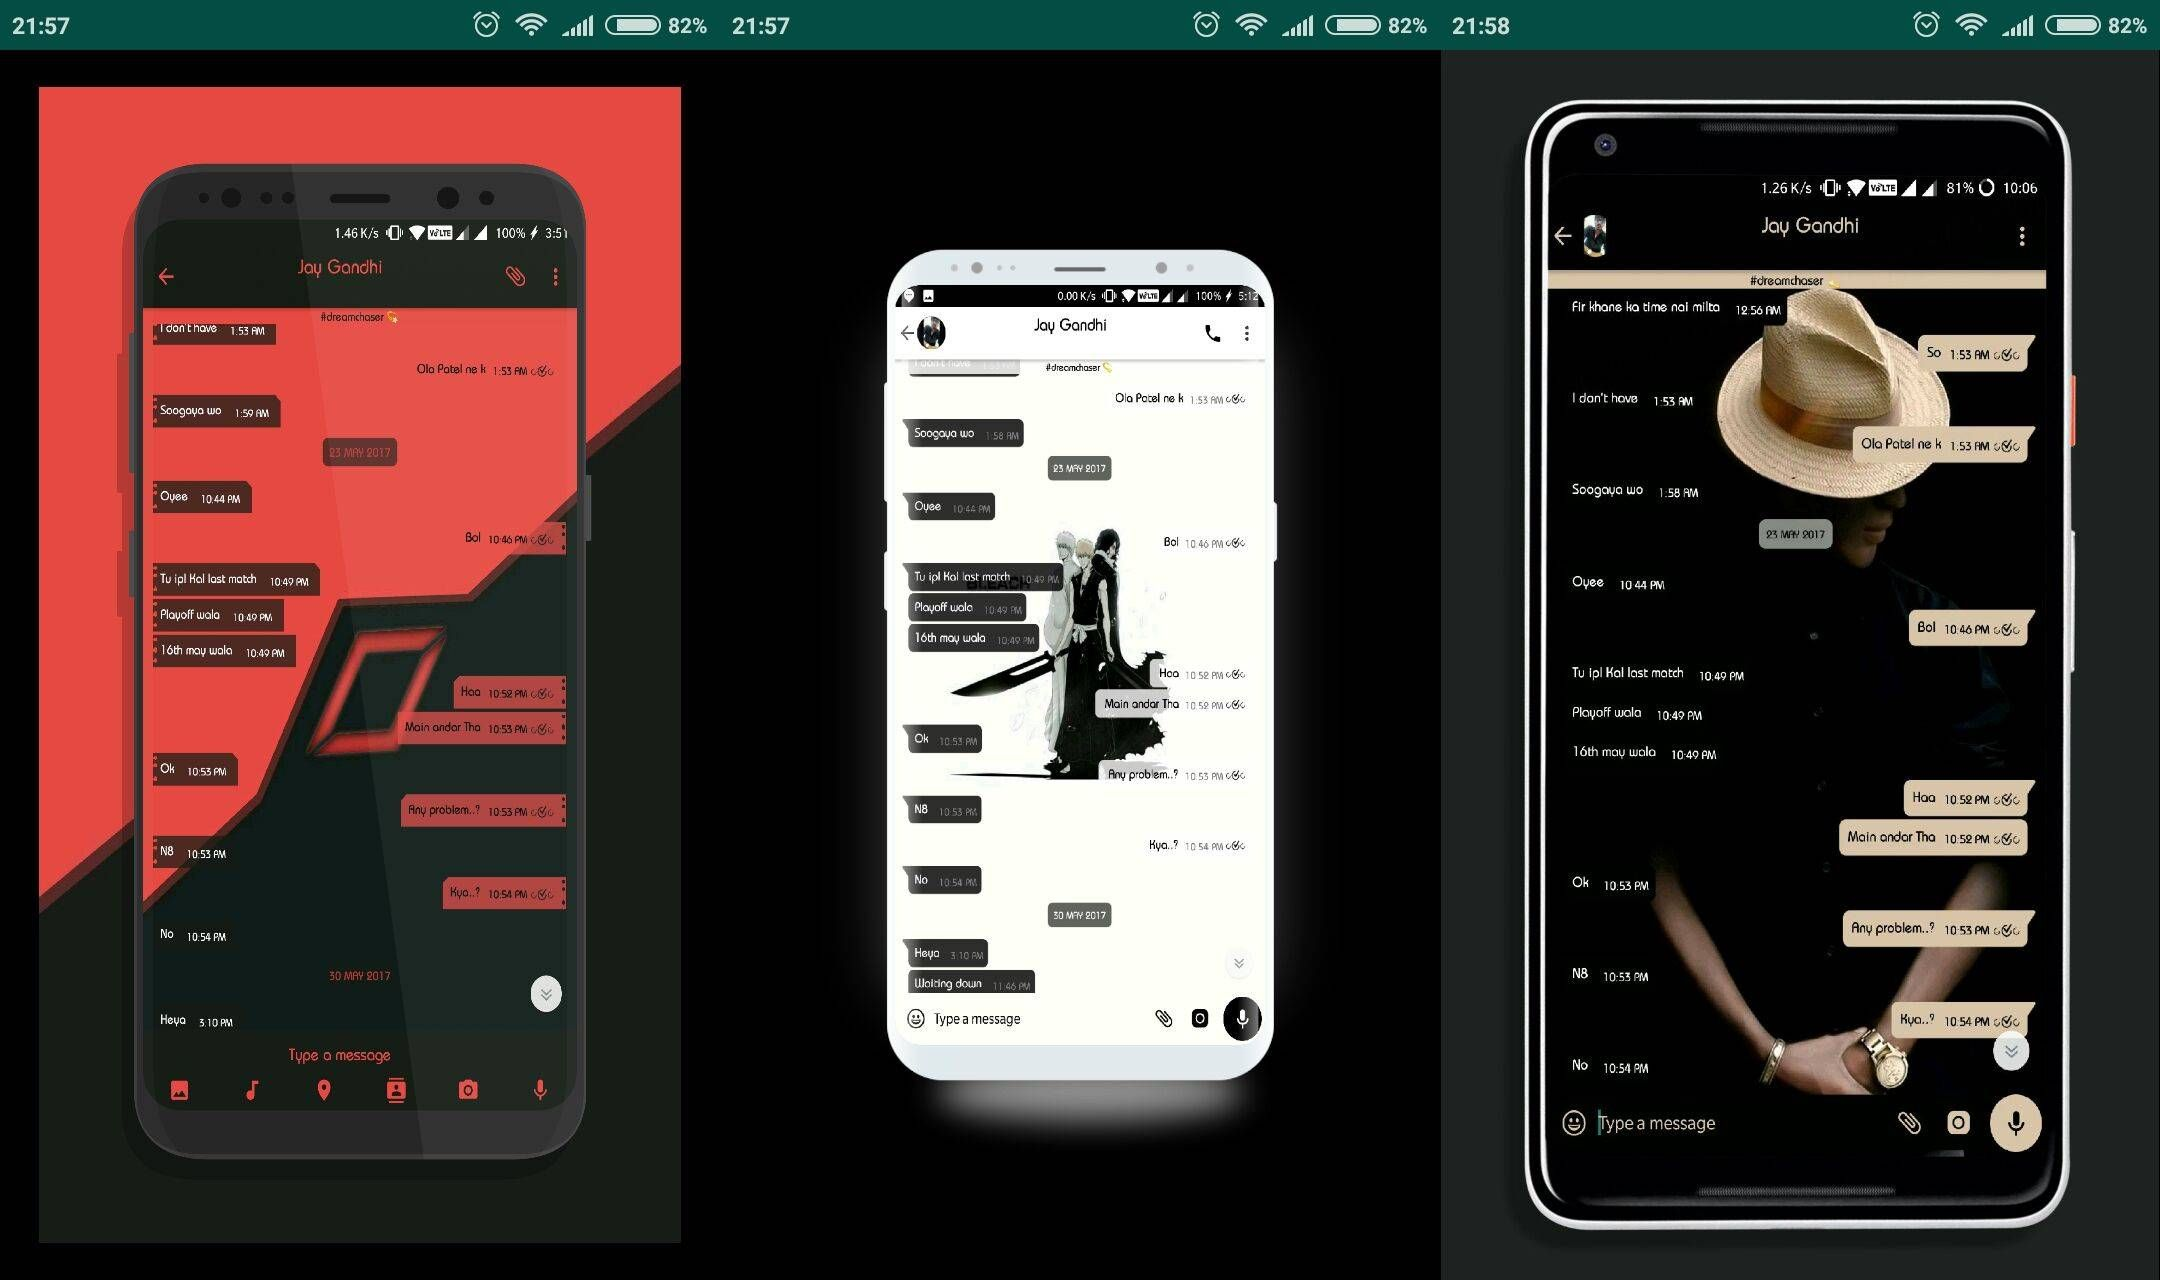 Download Tema Whatsapp Terbaru Lucu Dan Keren News Pinterest Xiaomi Mi 5c Smartphone 64gb 3gb Garansi Distributor